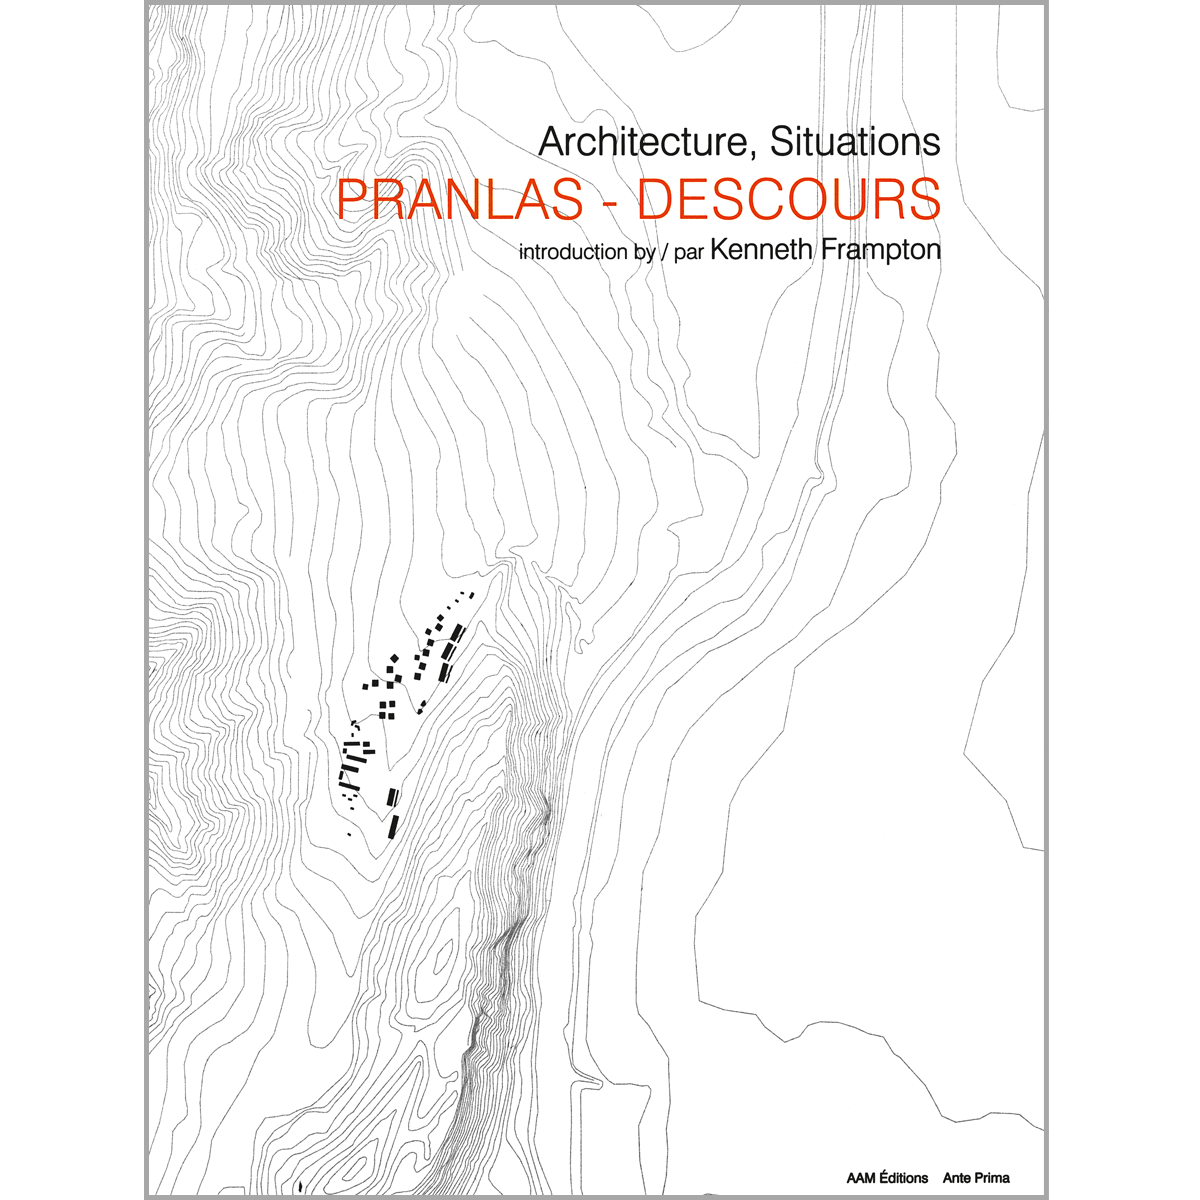 Pranlas-Descours